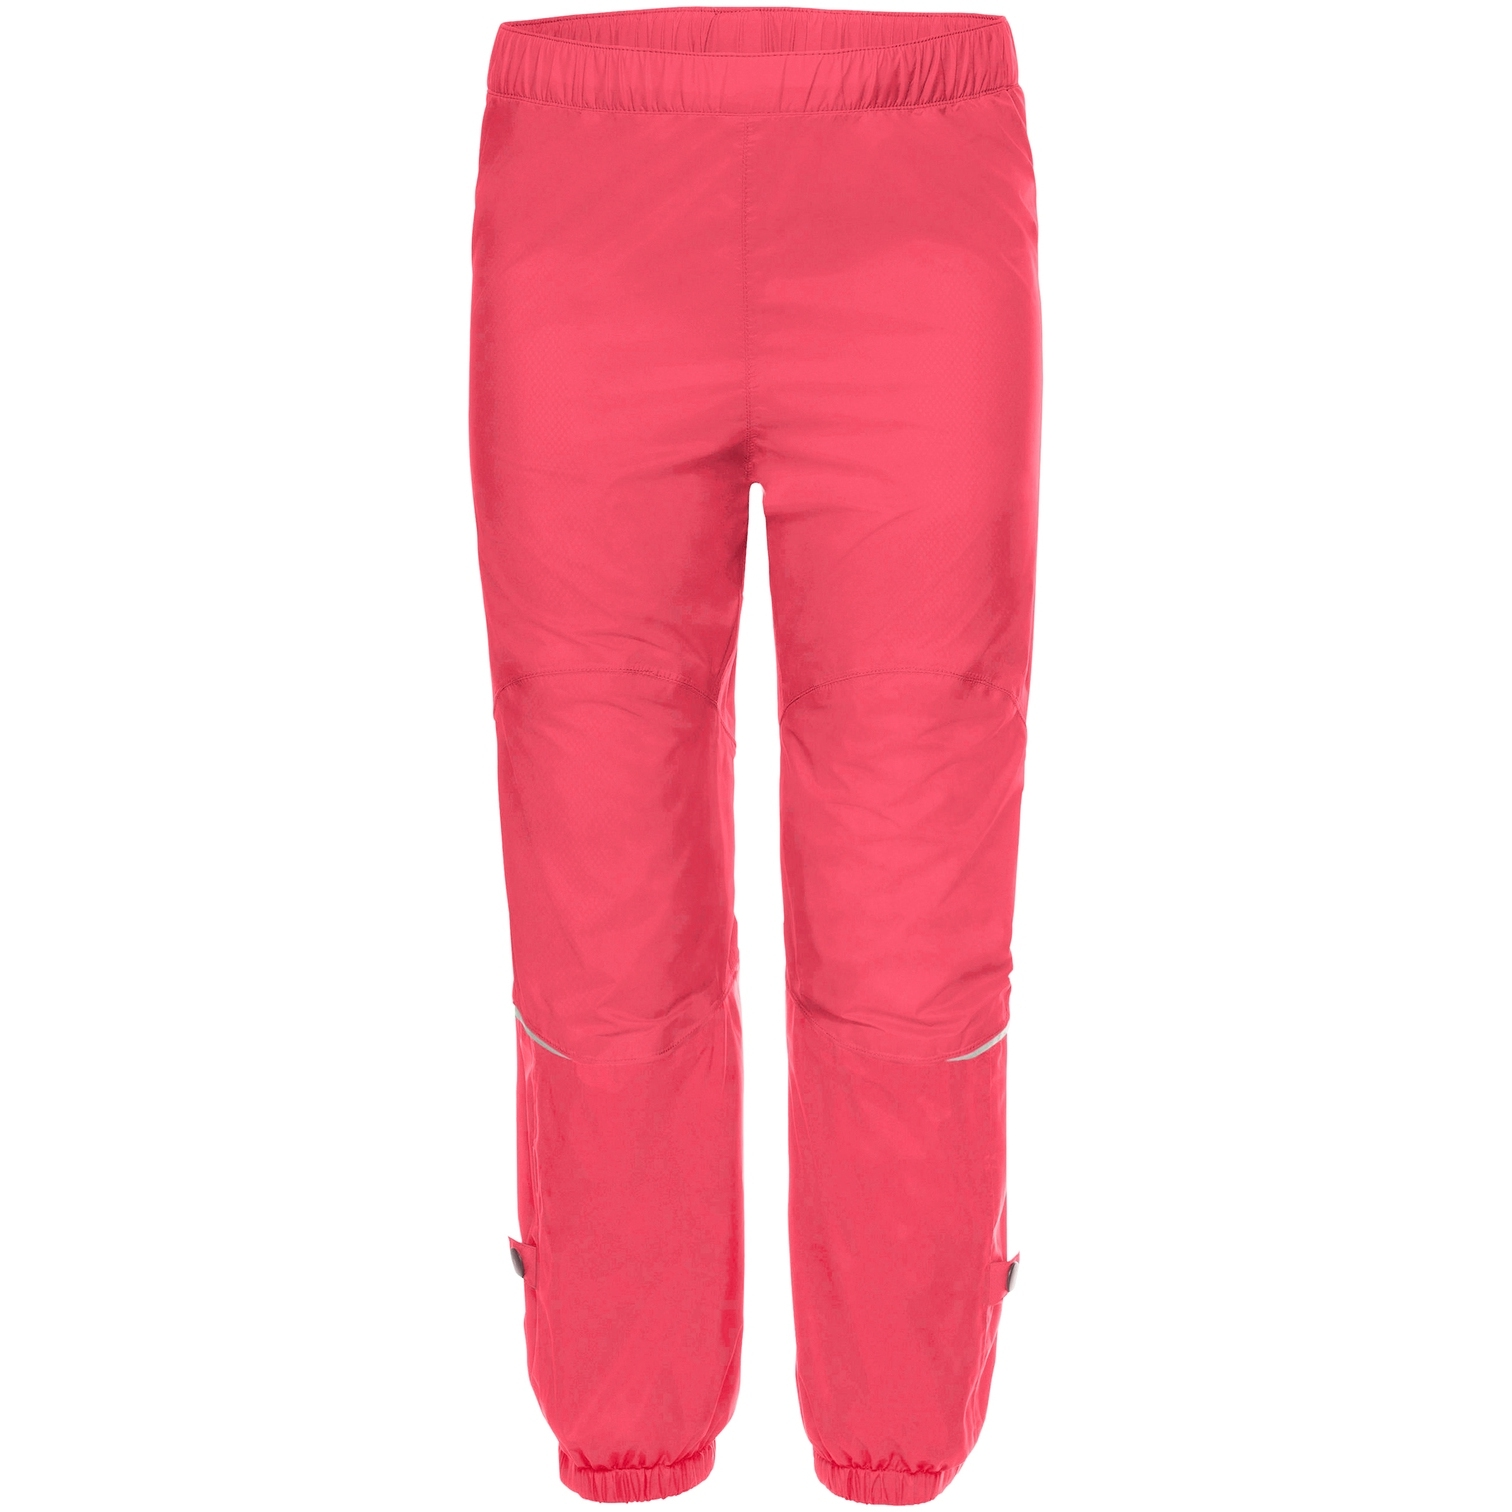 Vaude Kids Grody Hose IV - bright pink